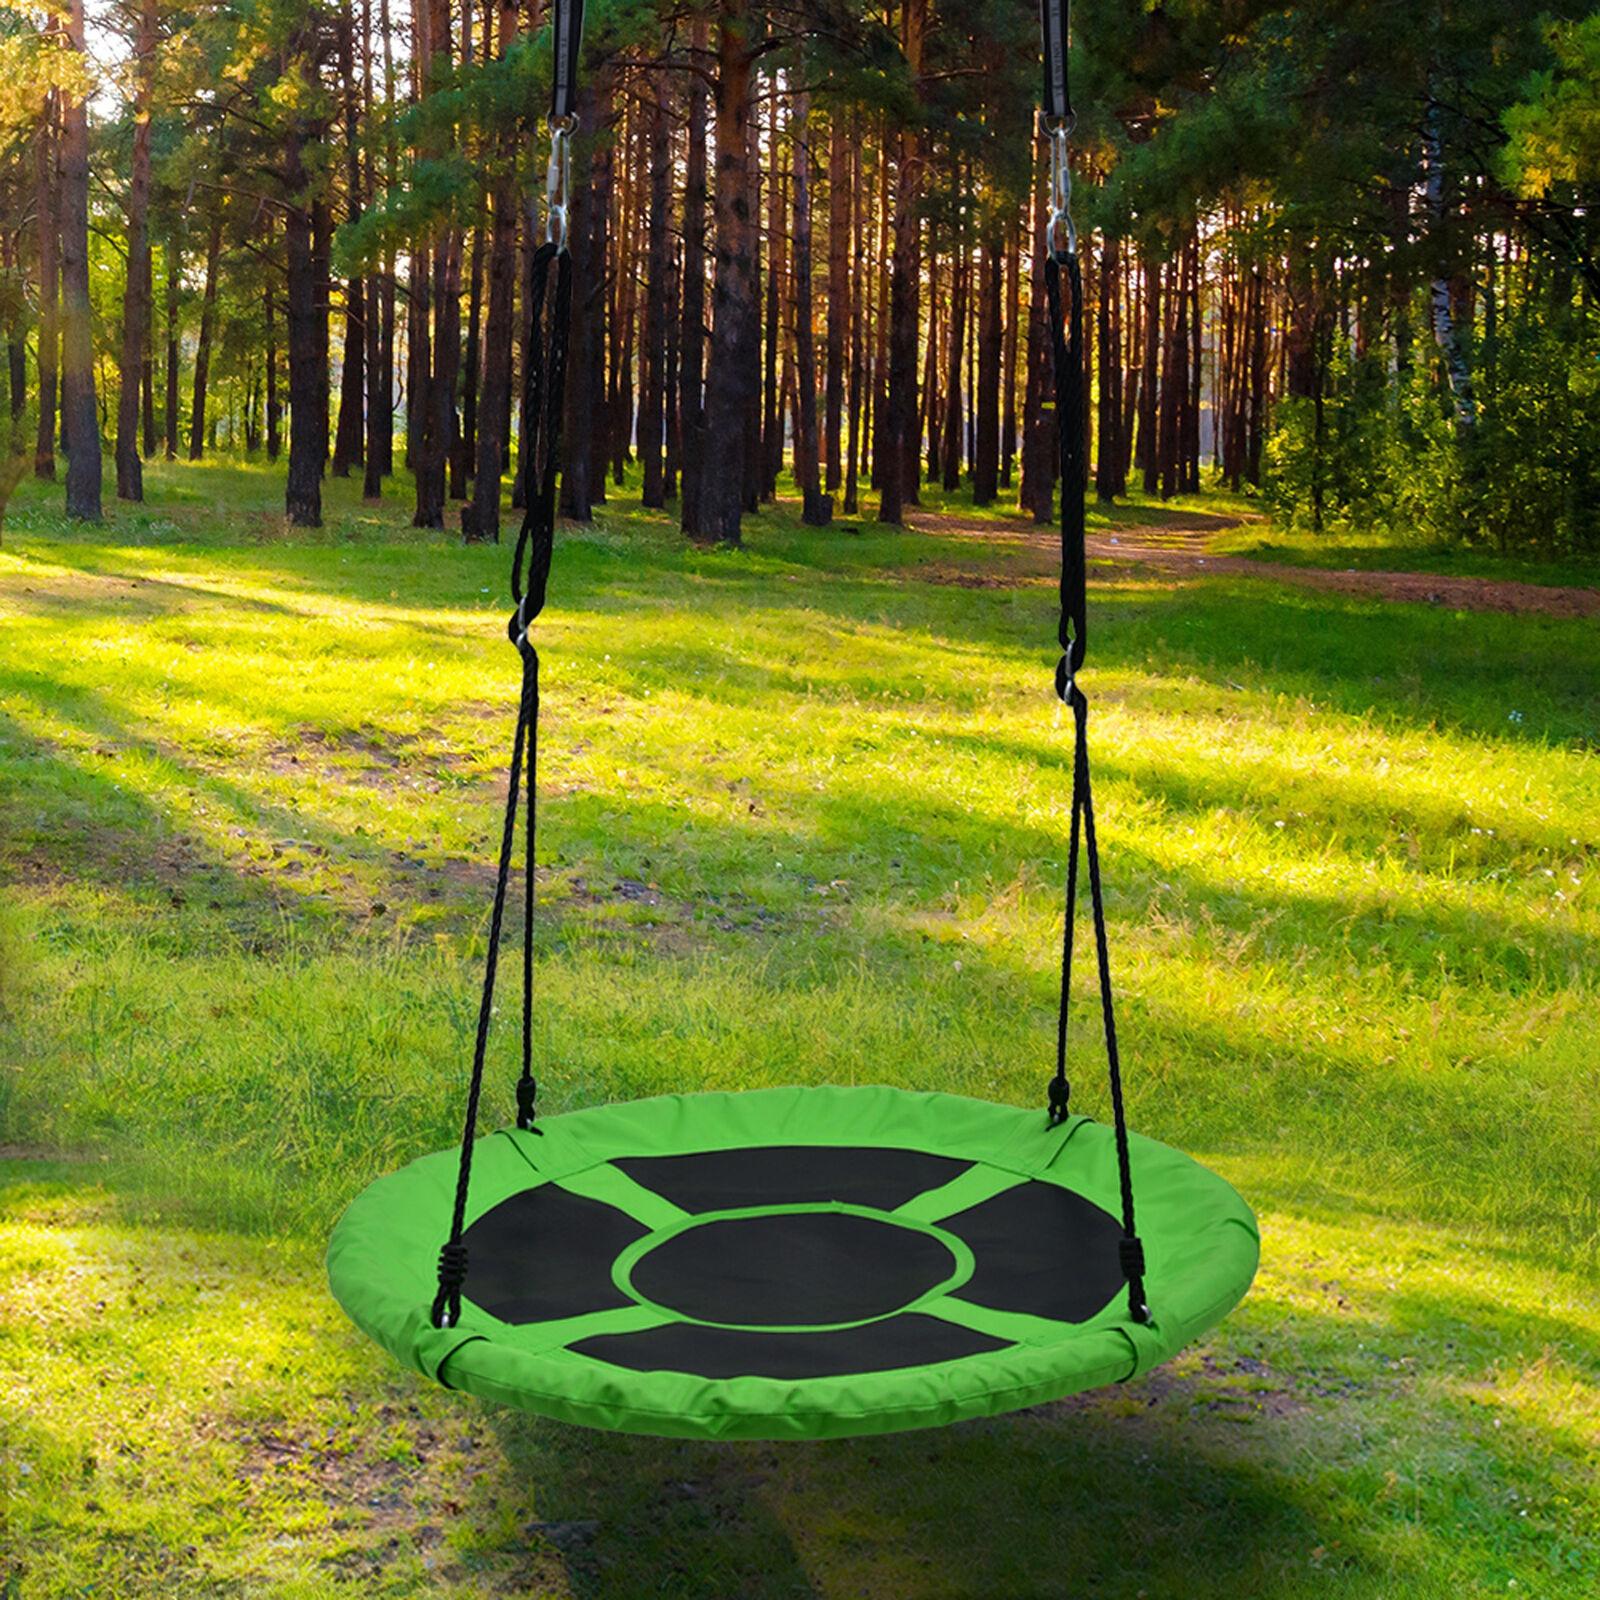 Detachable Swing Sets for Kids Playground Platform Saucer Sw